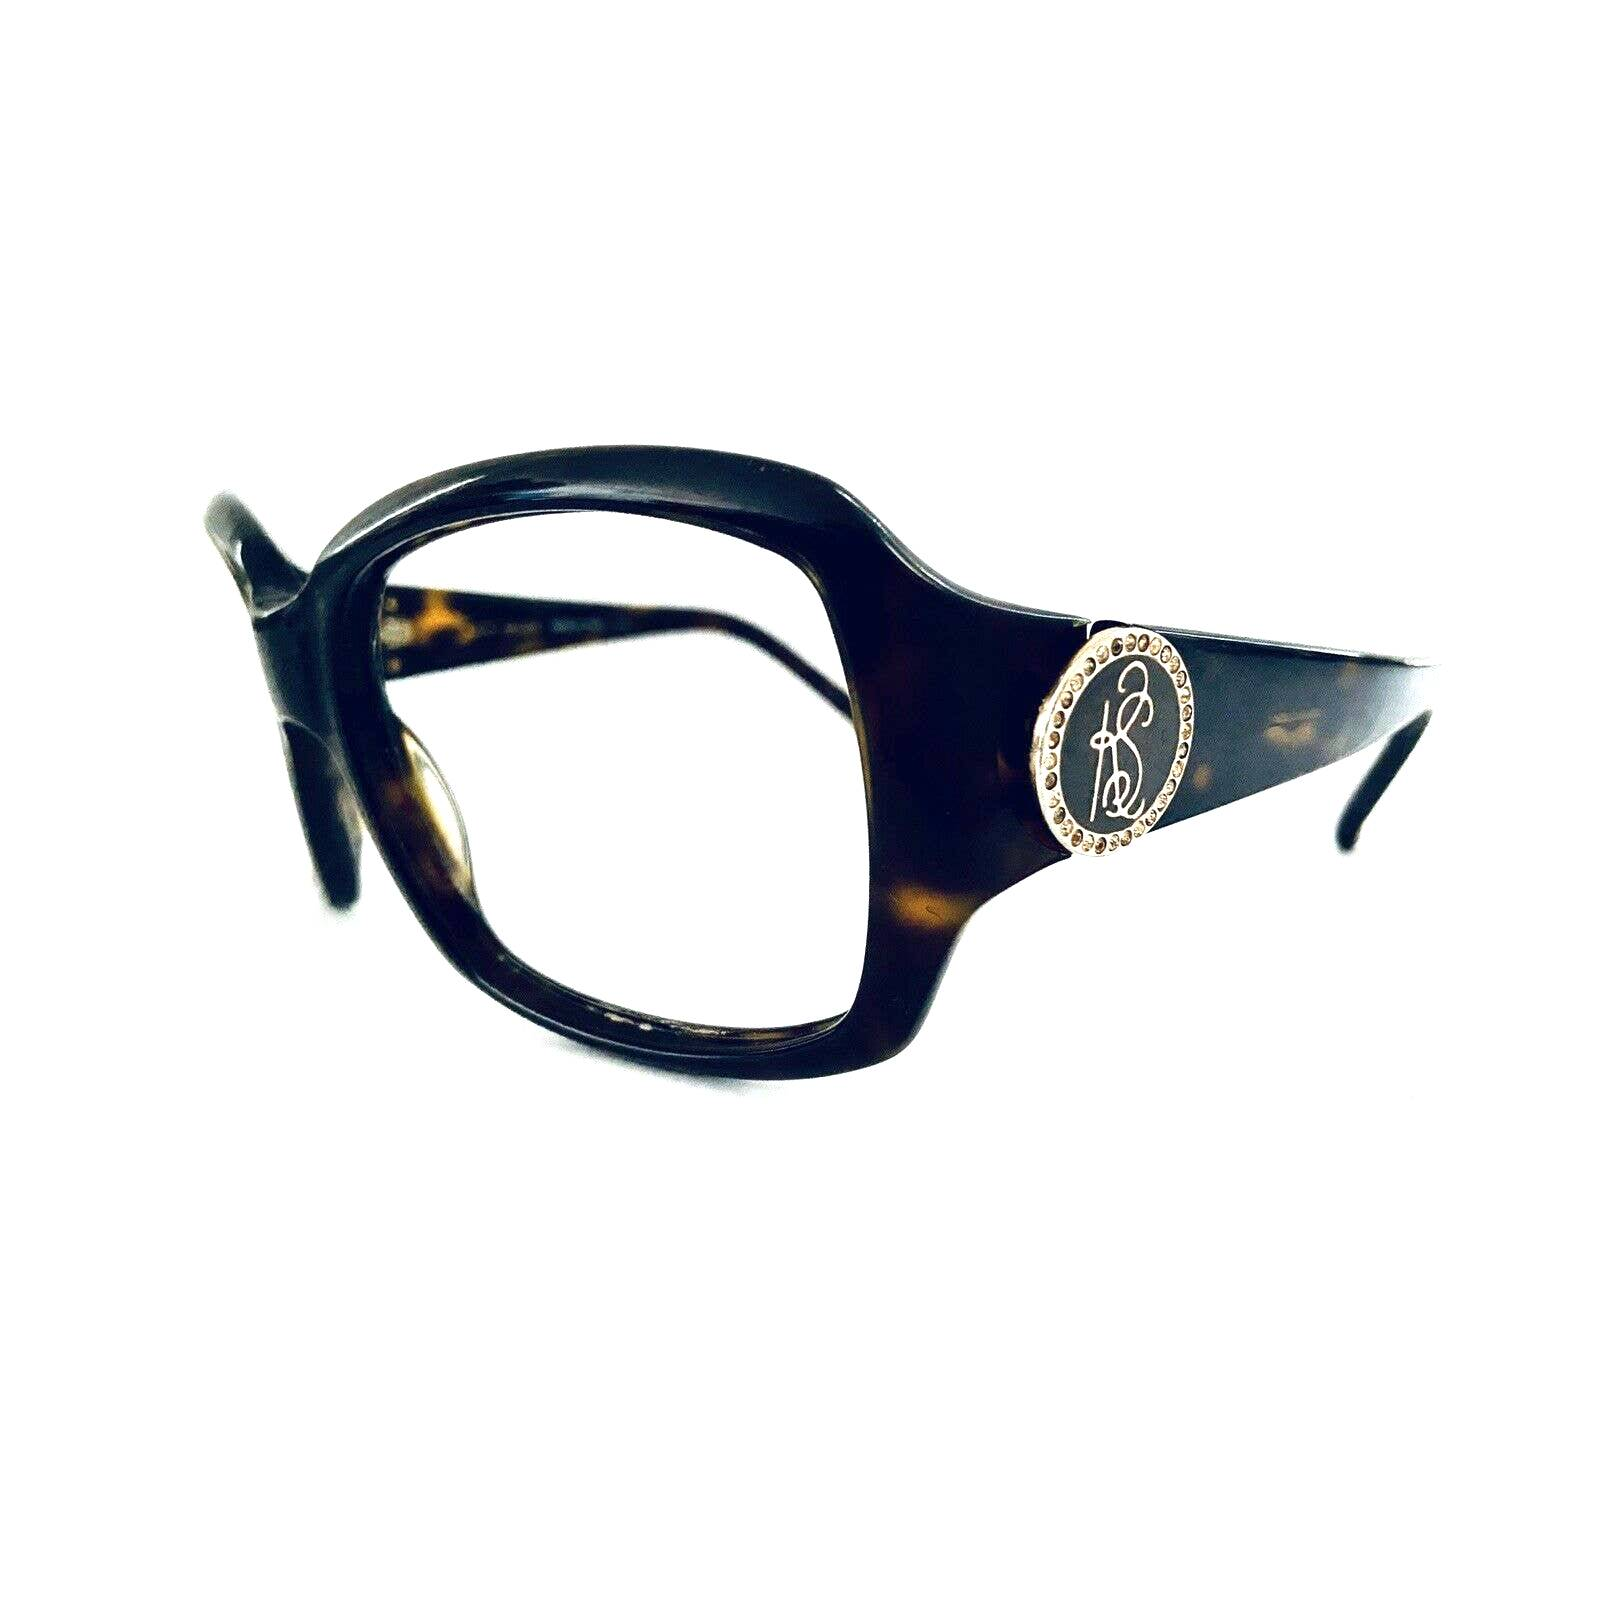 Kate Spade Oversize Oval Frame Glasses